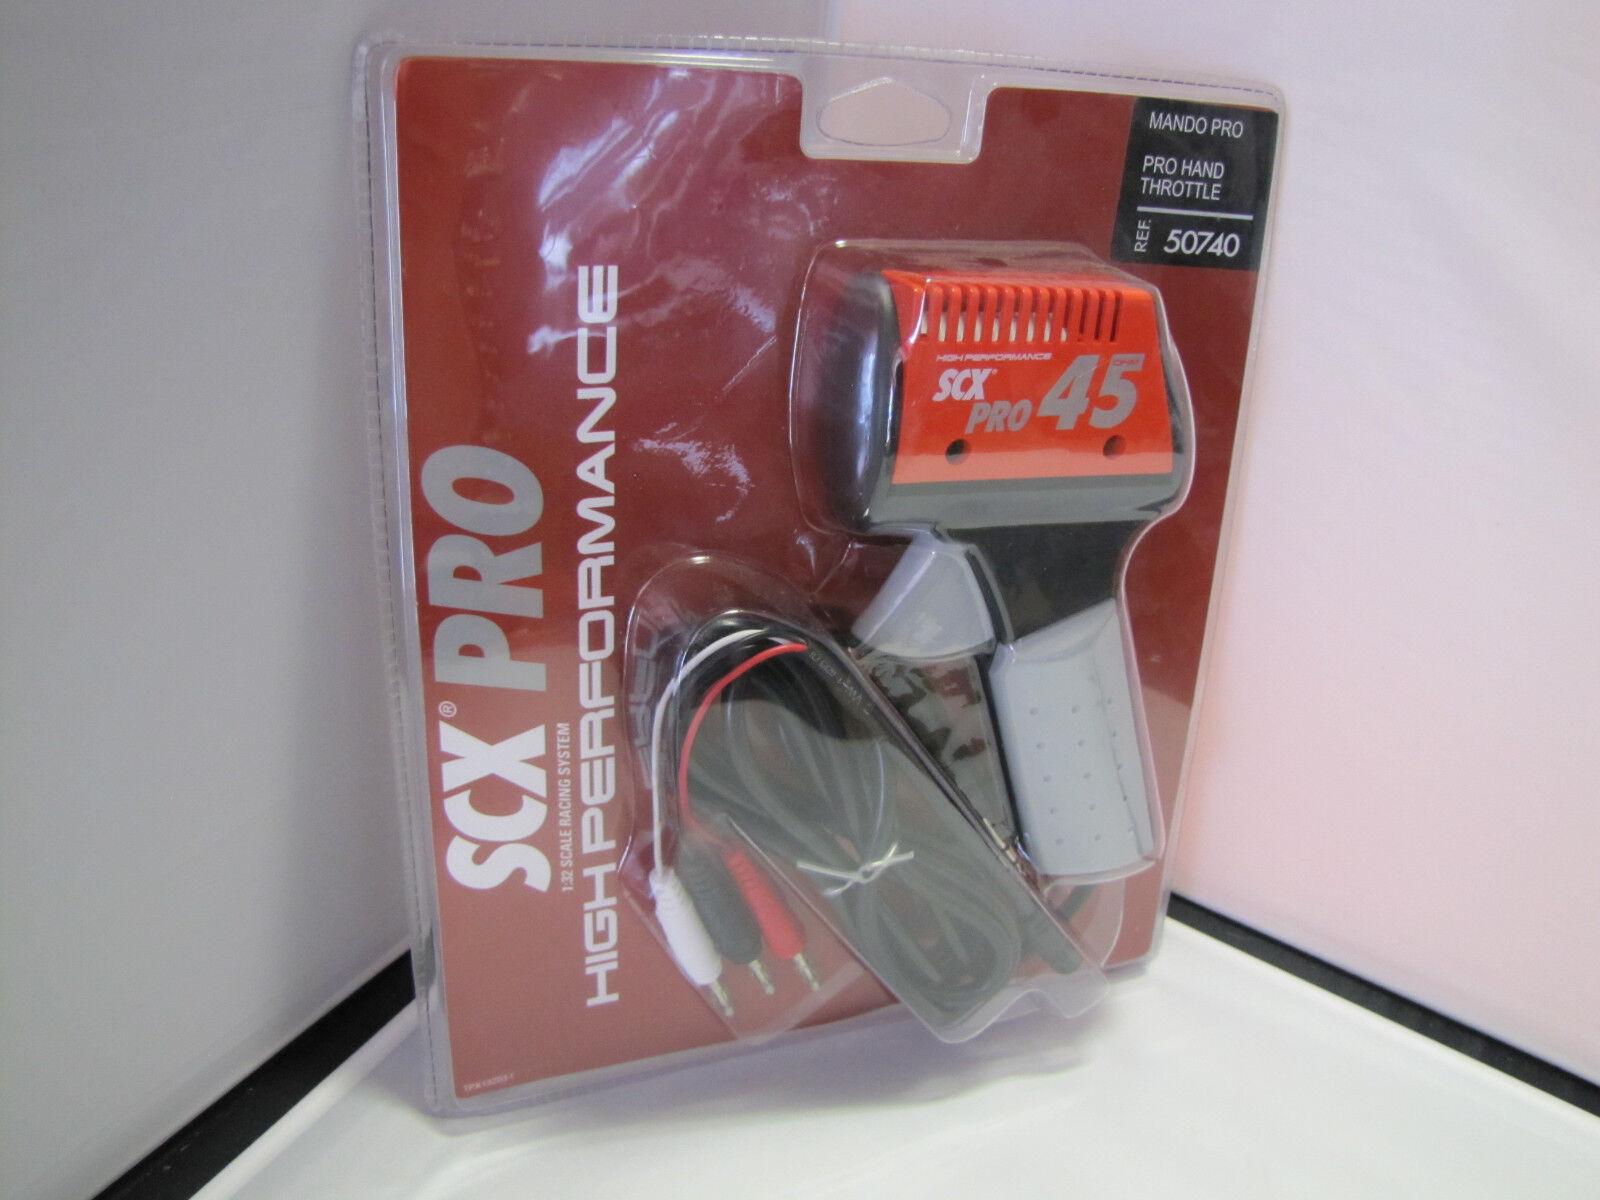 REF. 50740 SCX Pro Pro Pro 45 High Performance Hand Throttle - 1 32  - NEU   OVP  | Elegantes und robustes Menü  b60a4c